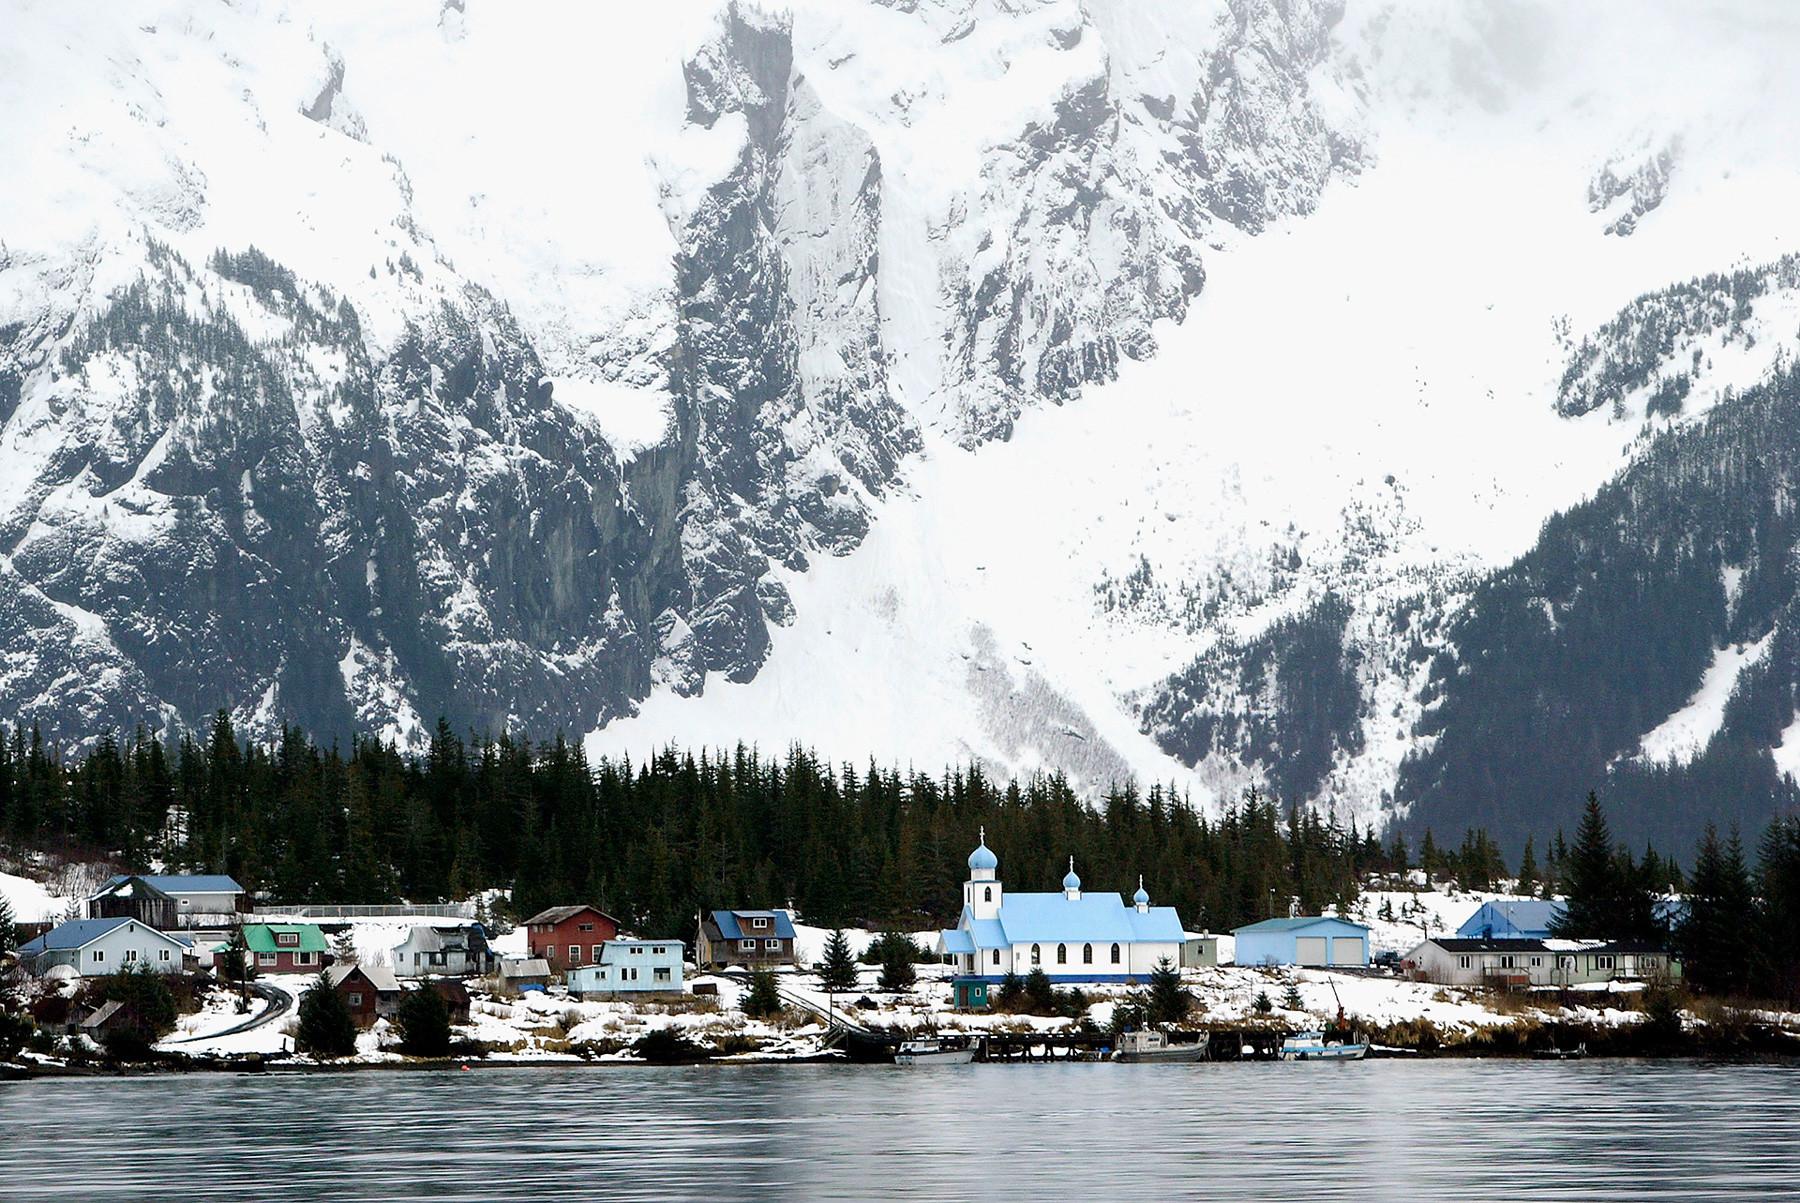 Кенай, Аляска